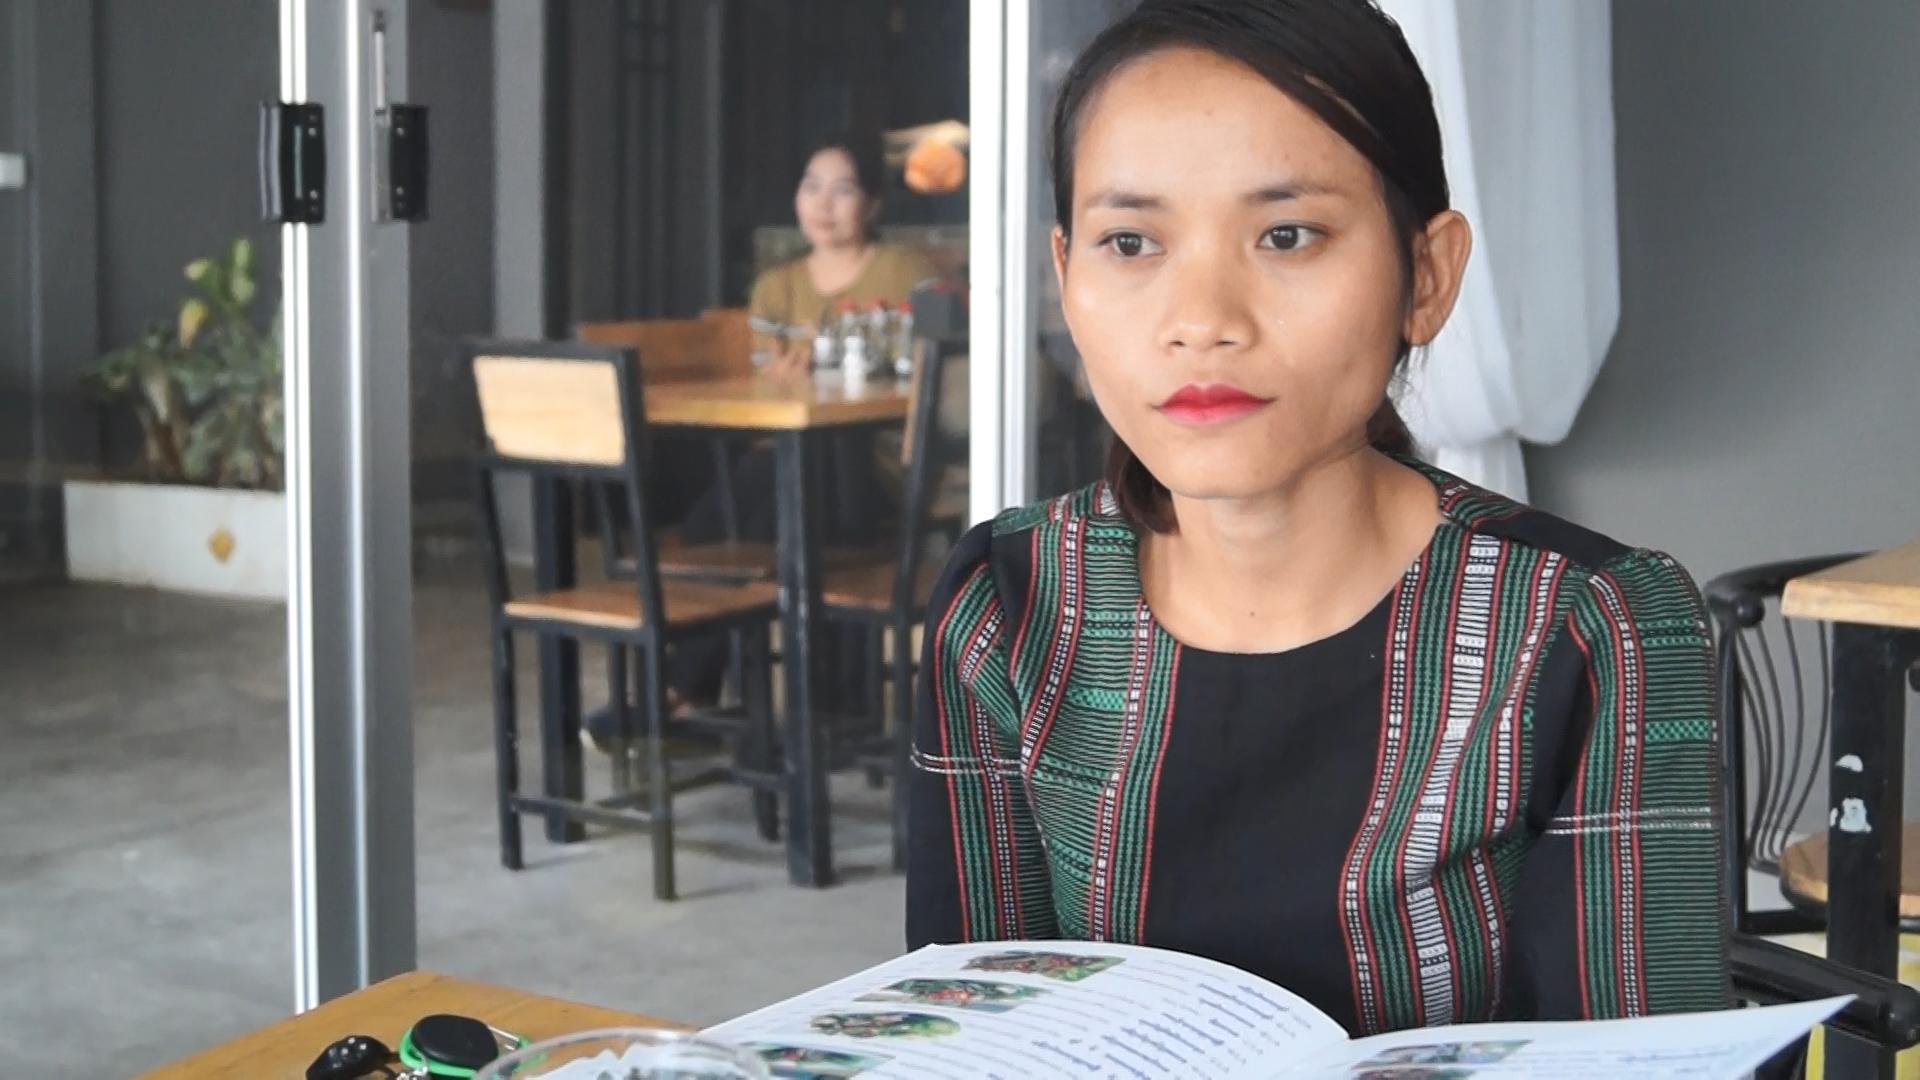 Copy of A Bunong Girl's Story (រឿងរបស់ស្ត្រីជនជាតិដើមភាគតិចភ្នង) | REMIX Phnom Penh 2019